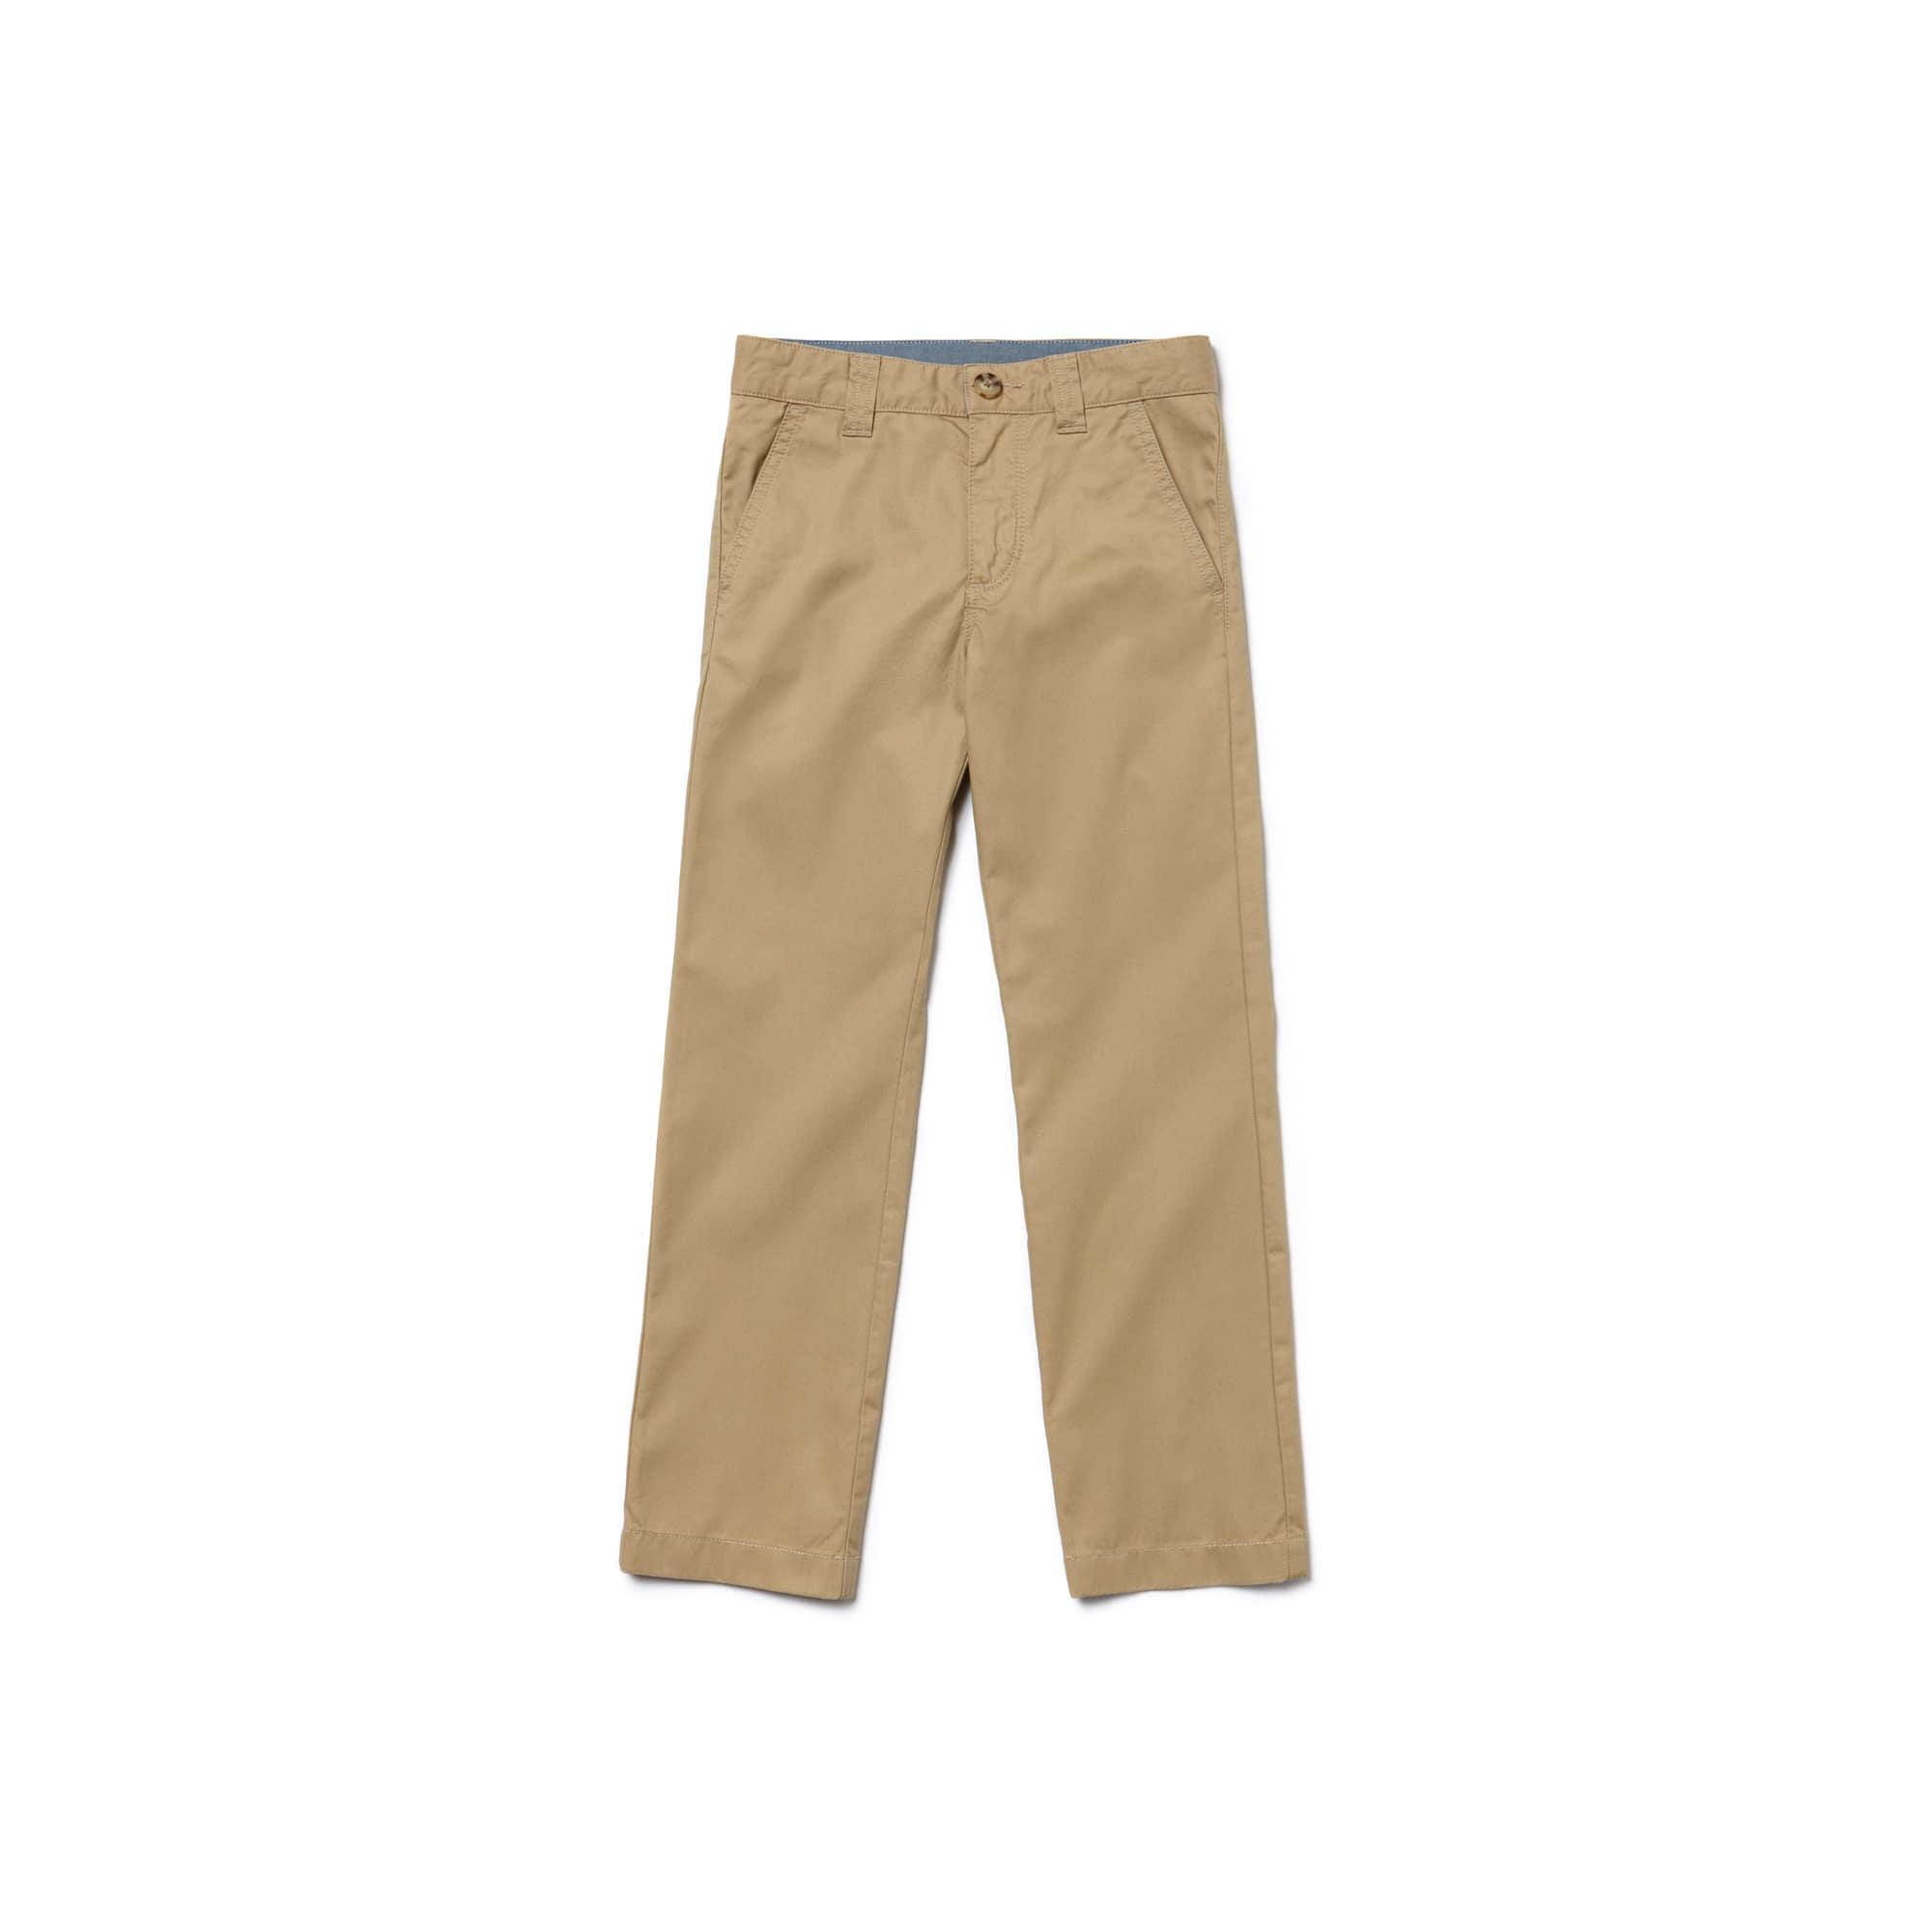 Kids Chino pants in colored cotton gabardine